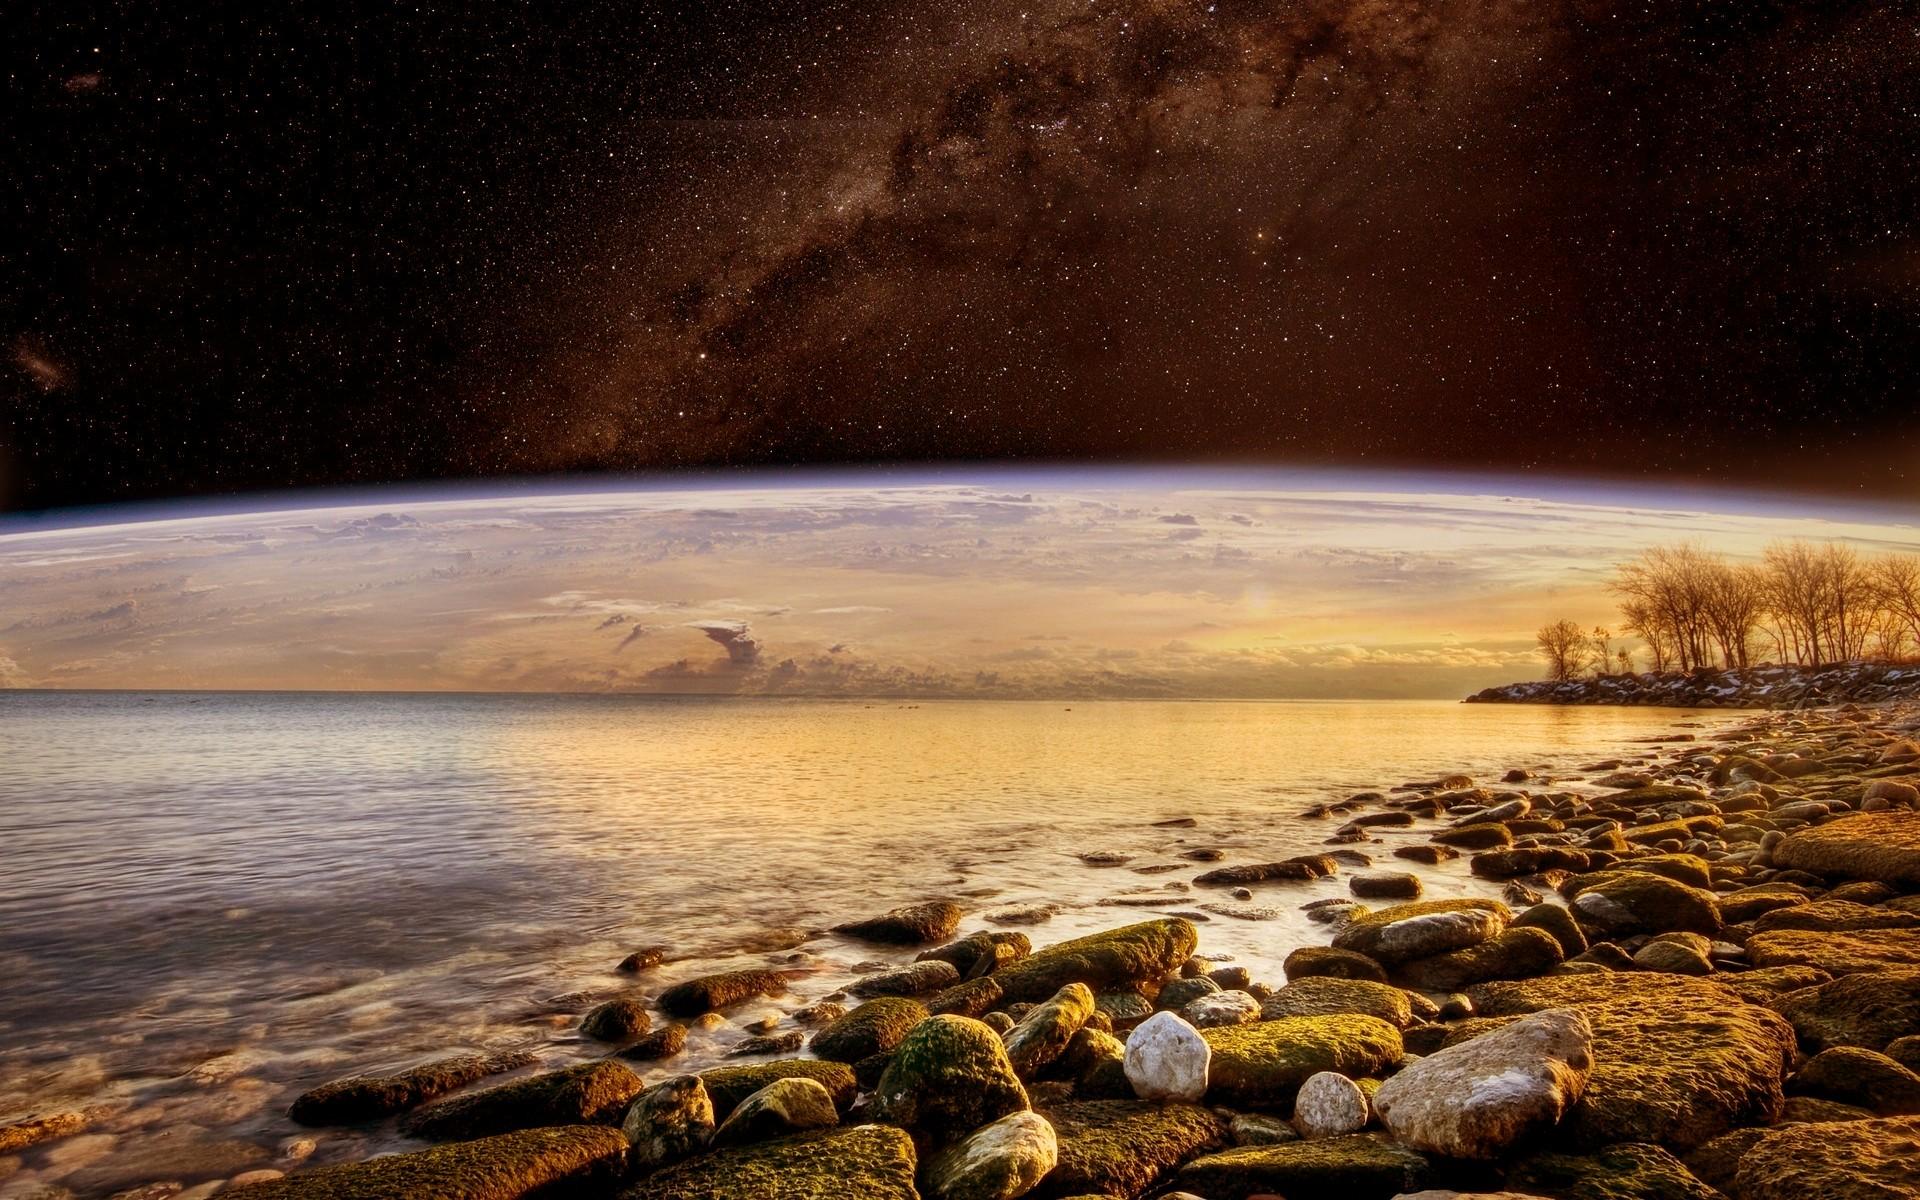 sci fi landscape alien planets - photo #19